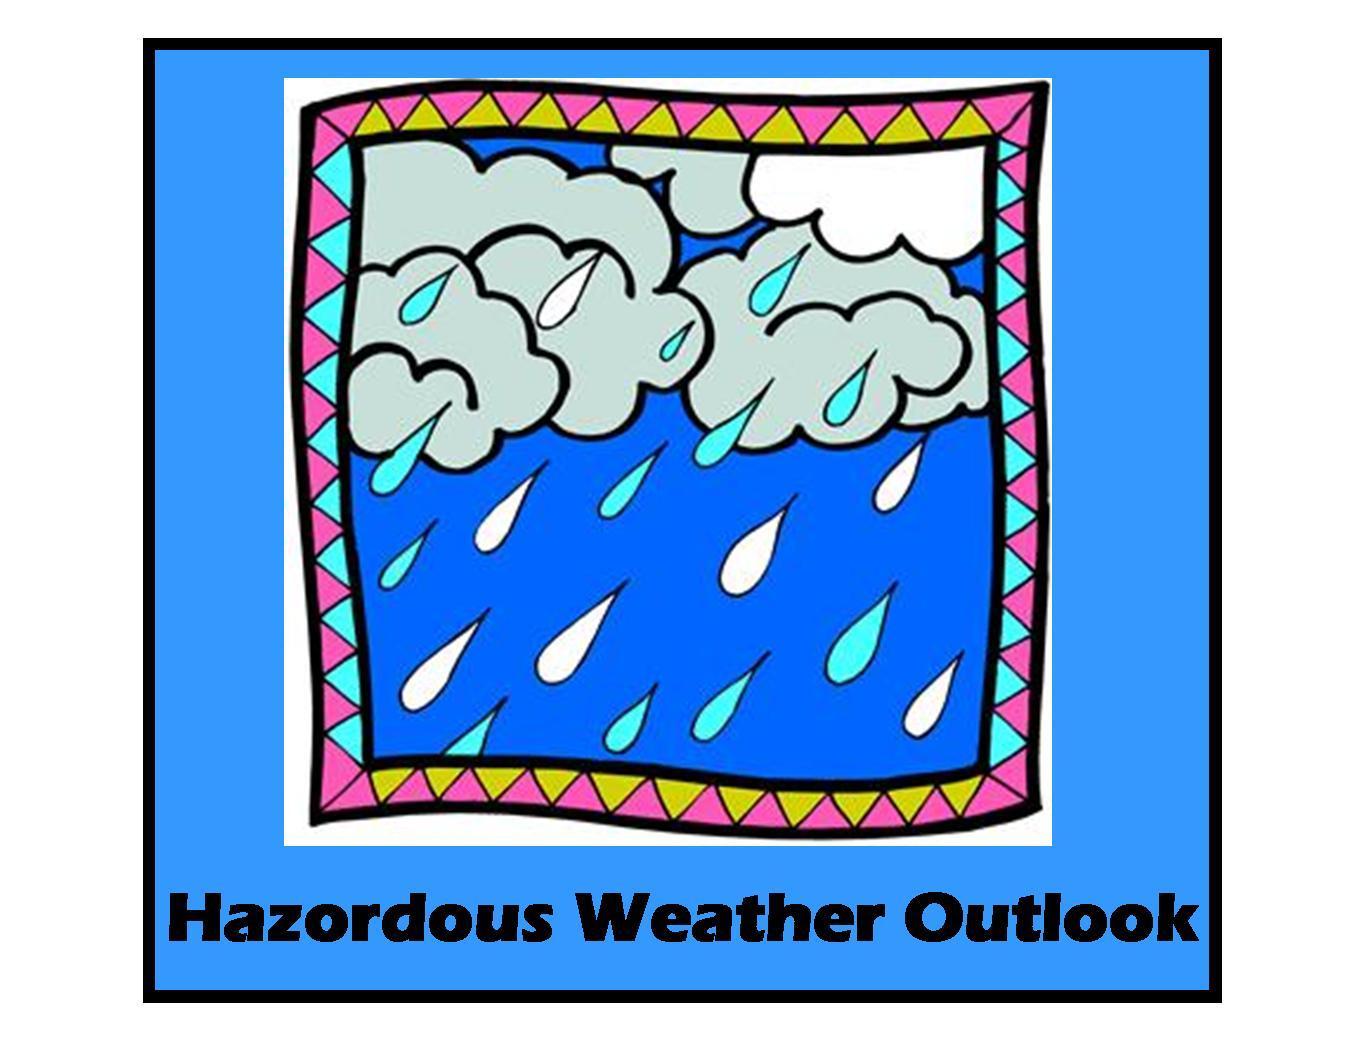 b2868cbe63578ace9e6e_hazordous_weather_outlook.jpg